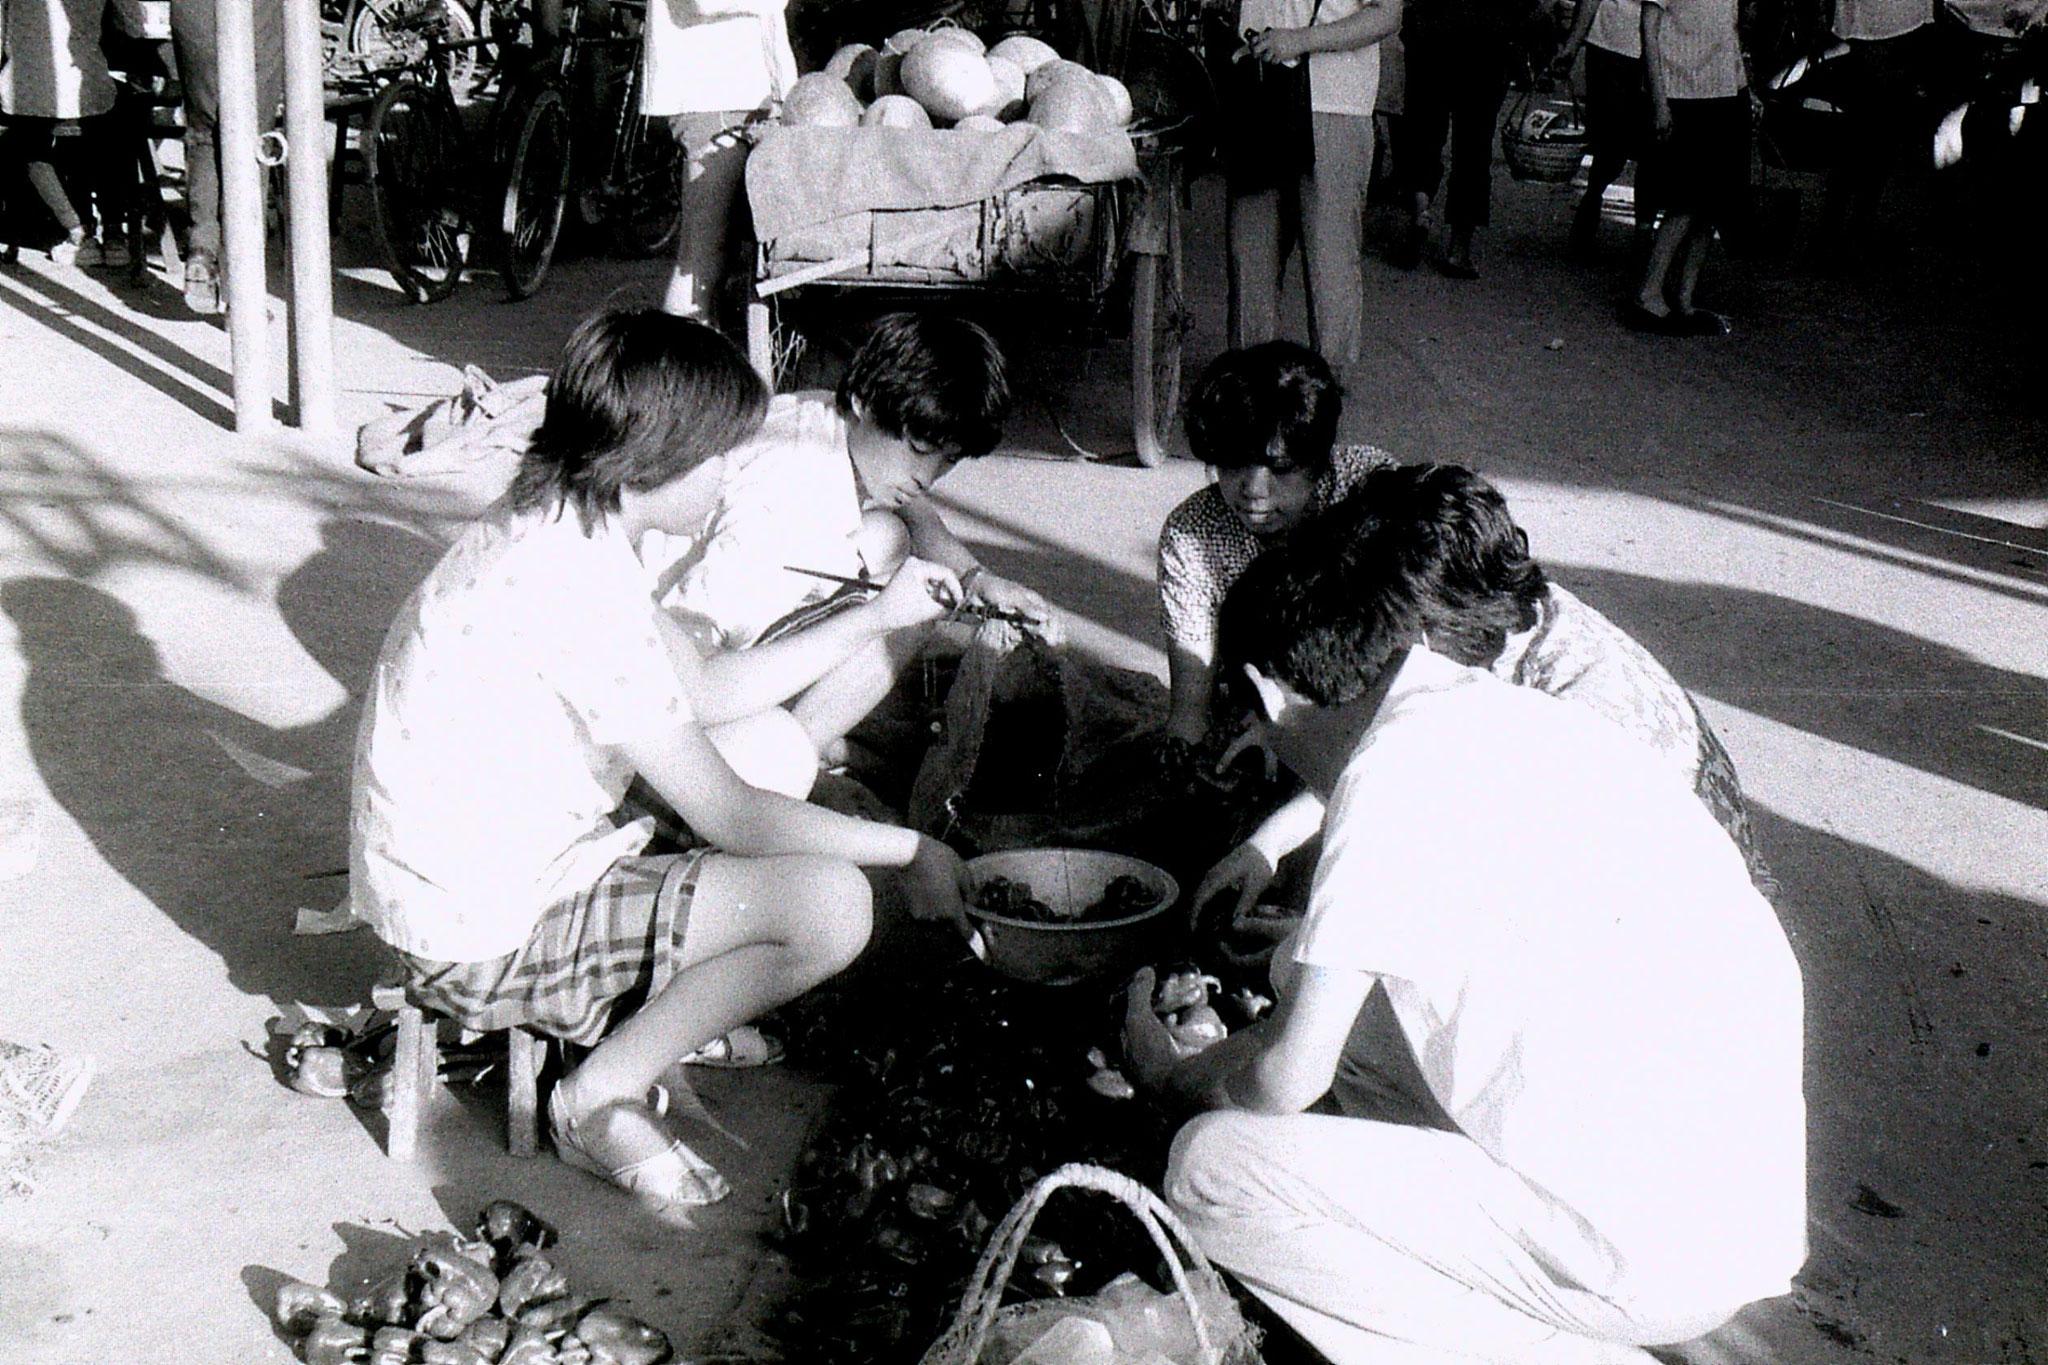 19/7/1989: 21: Zheda Free market